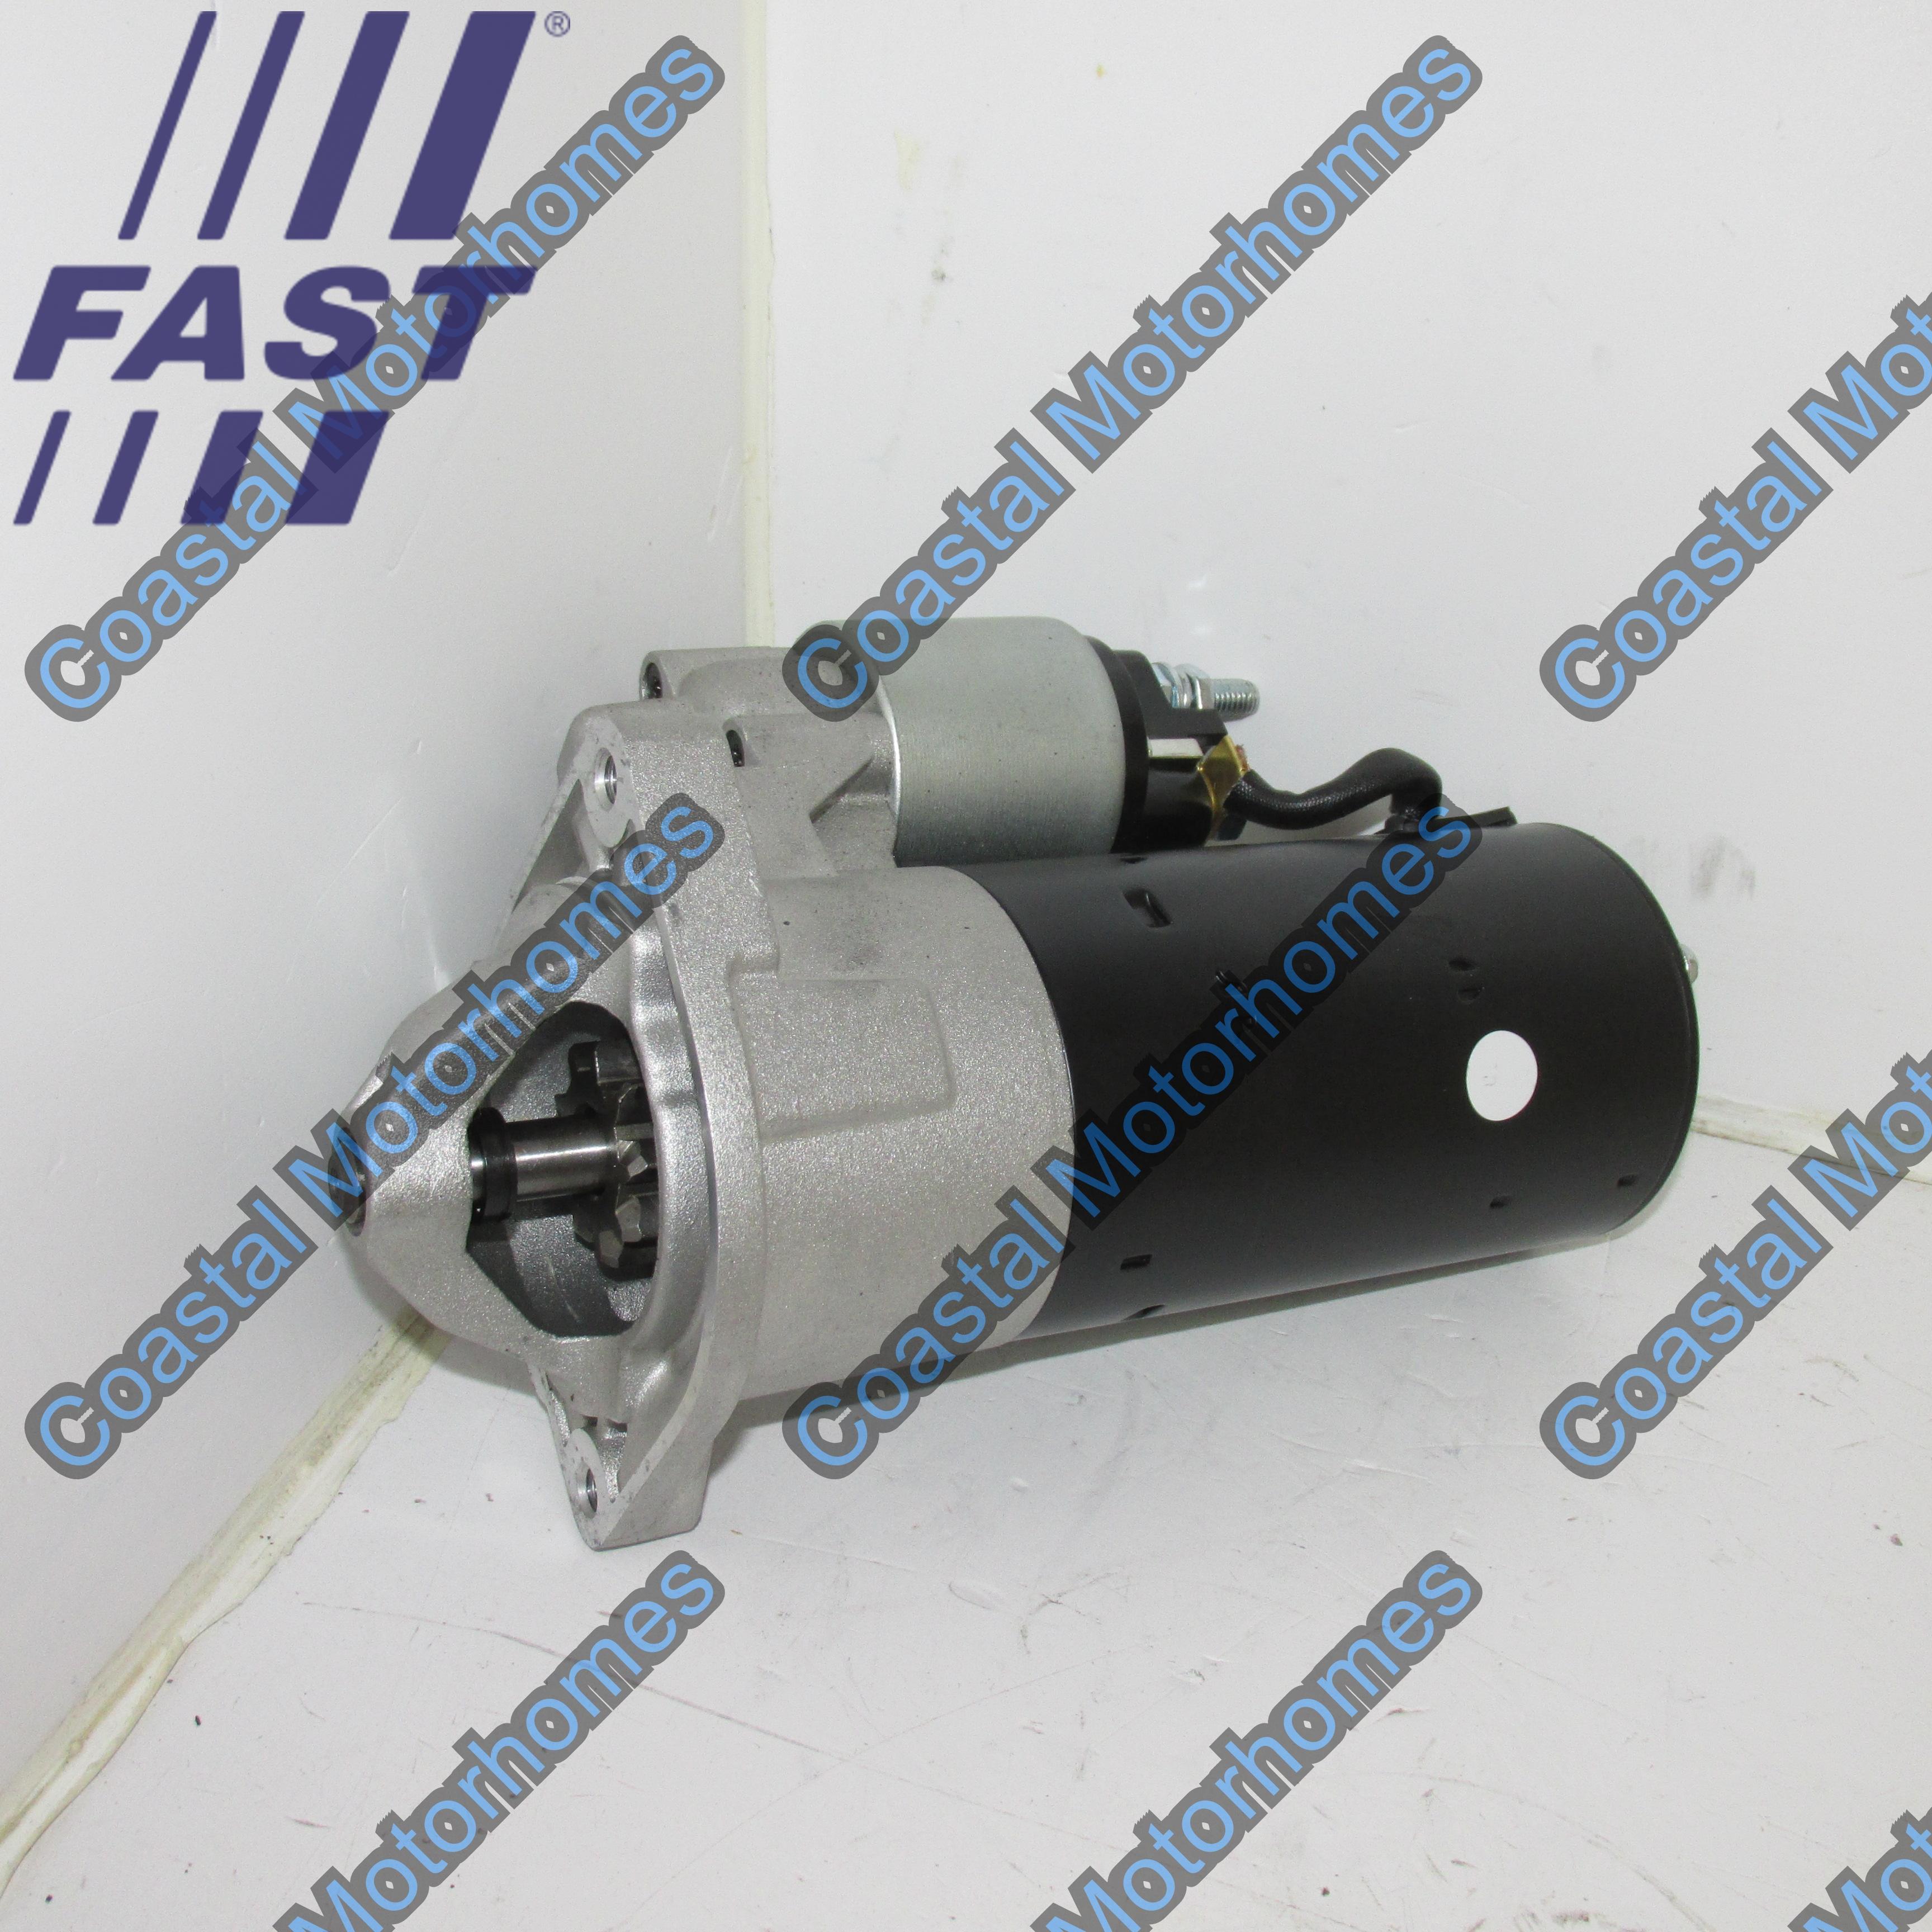 02-06 Fiat Ducato Peugeot Boxer Citroen Relay 2.3 2.8 TD JTD HDI Starter Motor